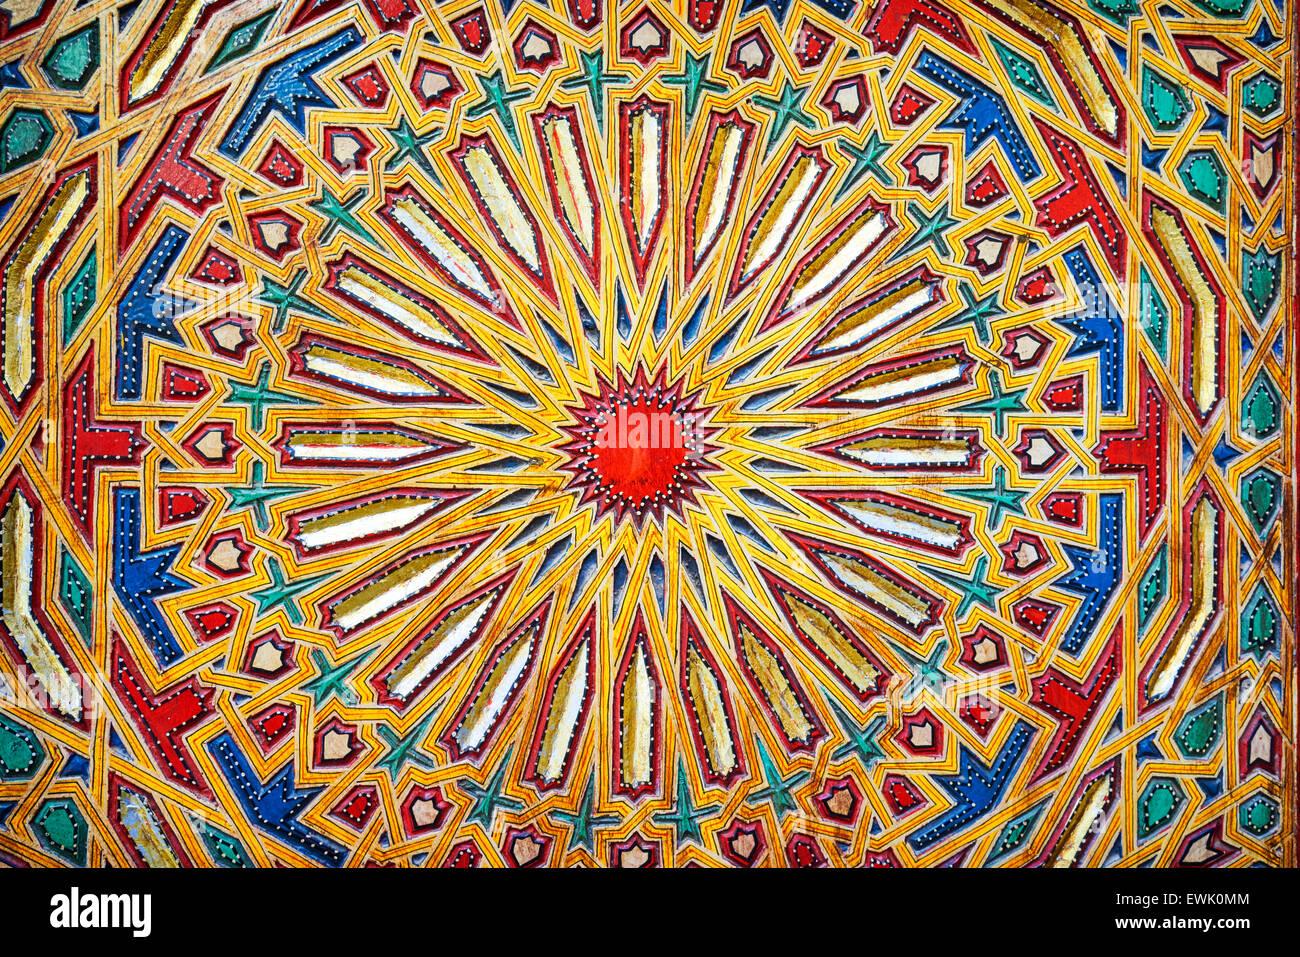 Detail of Mosque Sidi Ahmed Tijani, Fez Medina, Morocco, Africa - Stock Image